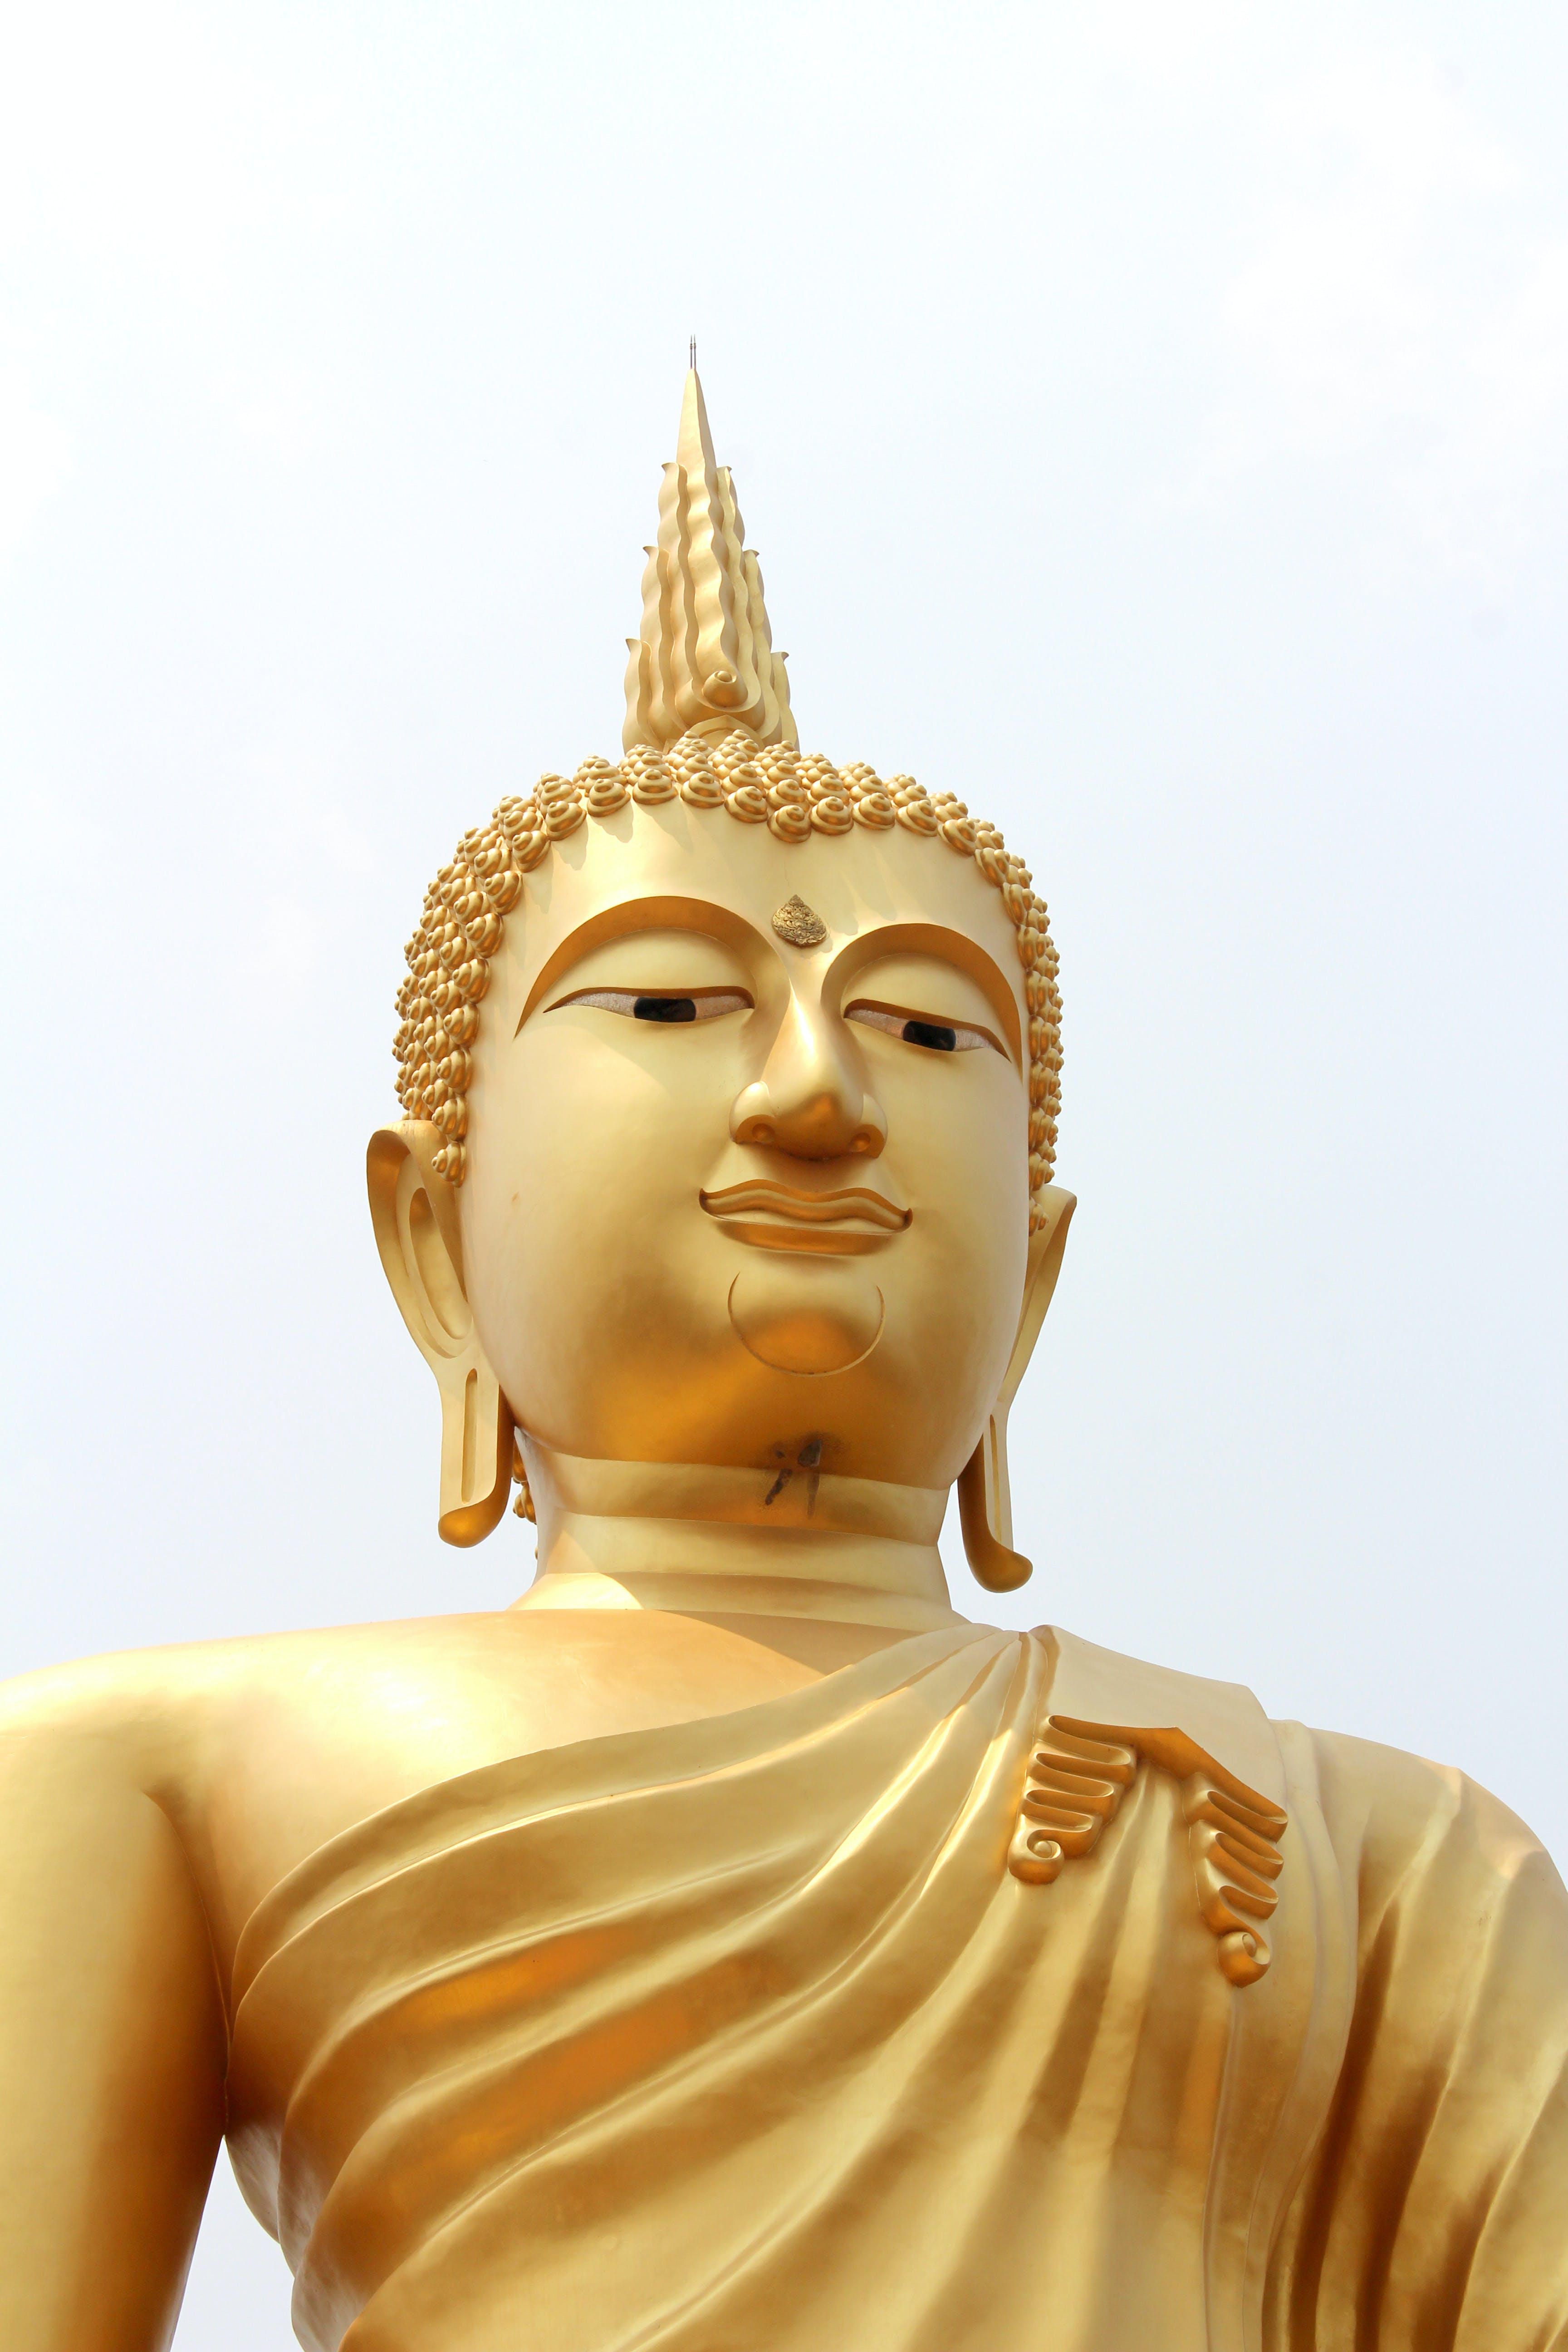 Gratis arkivbilde med åndelig, berømt, buddha, Buddhisme